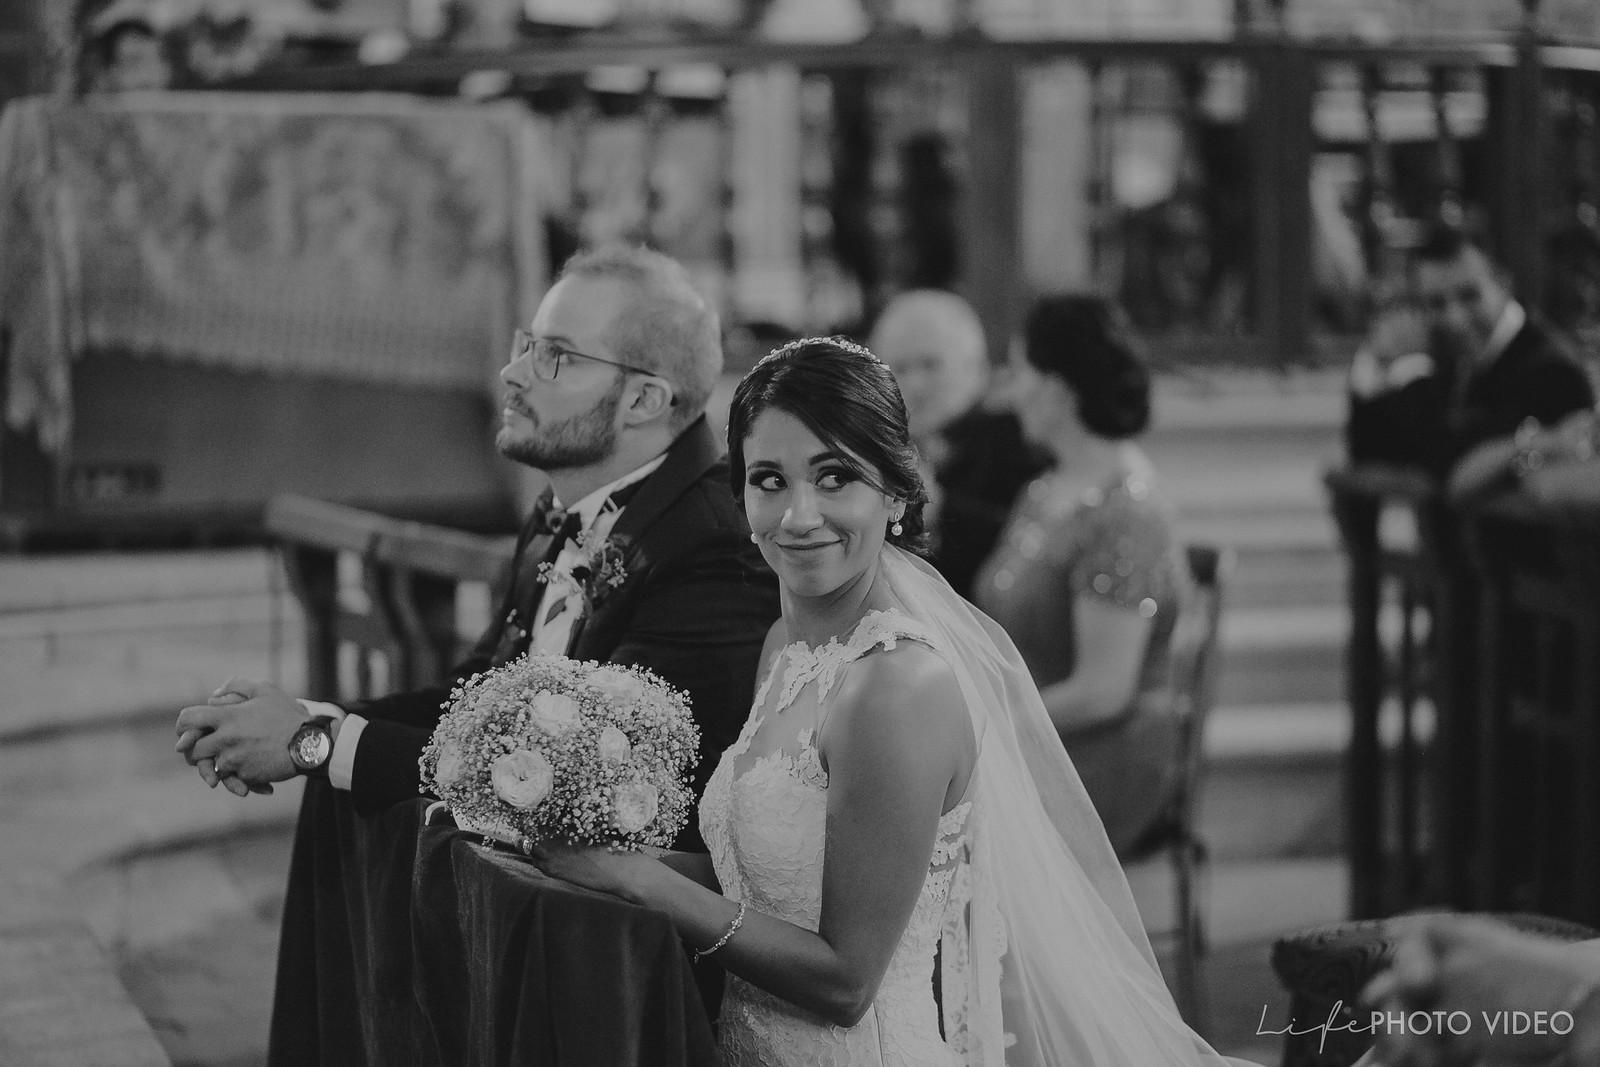 LifePhotoVideo_Boda_Guanajuato_Wedding_0046